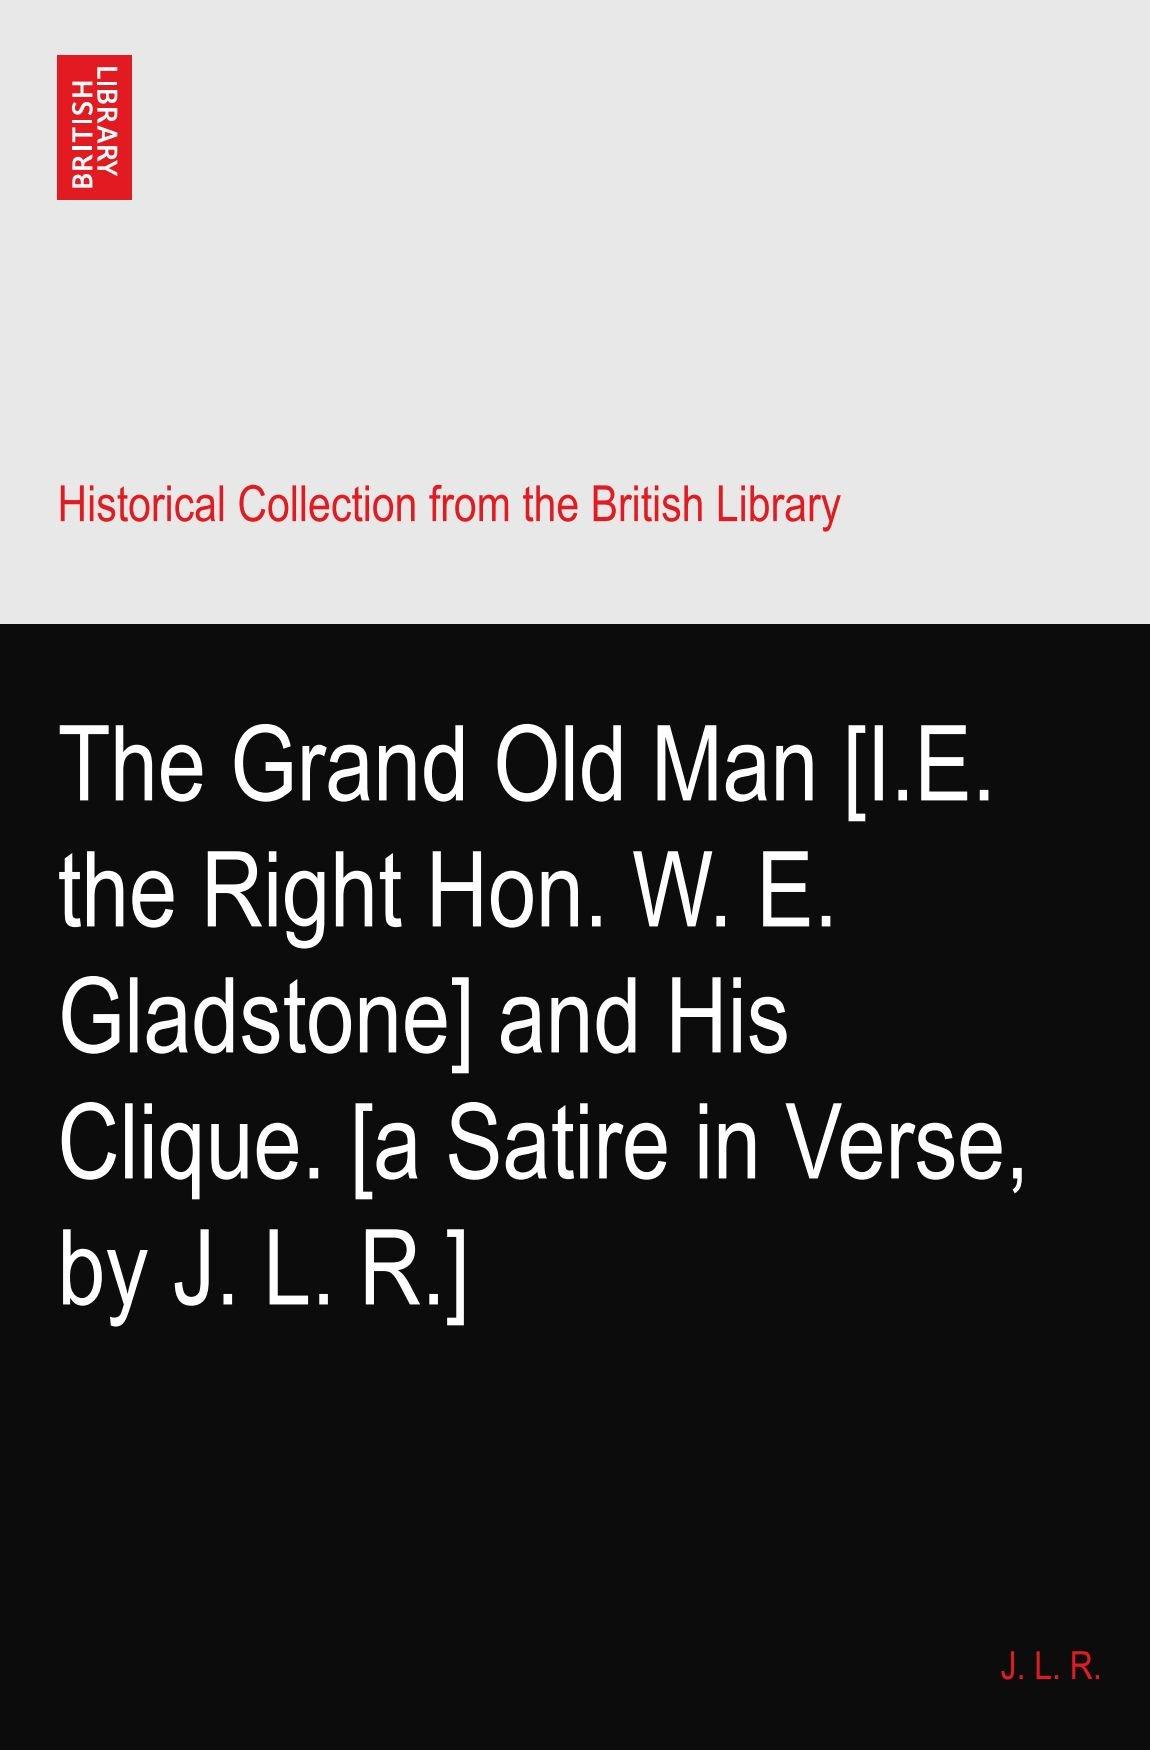 Download The Grand Old Man [I.E. the Right Hon. W. E. Gladstone] and His Clique. [a Satire in Verse, by J. L. R.] ebook